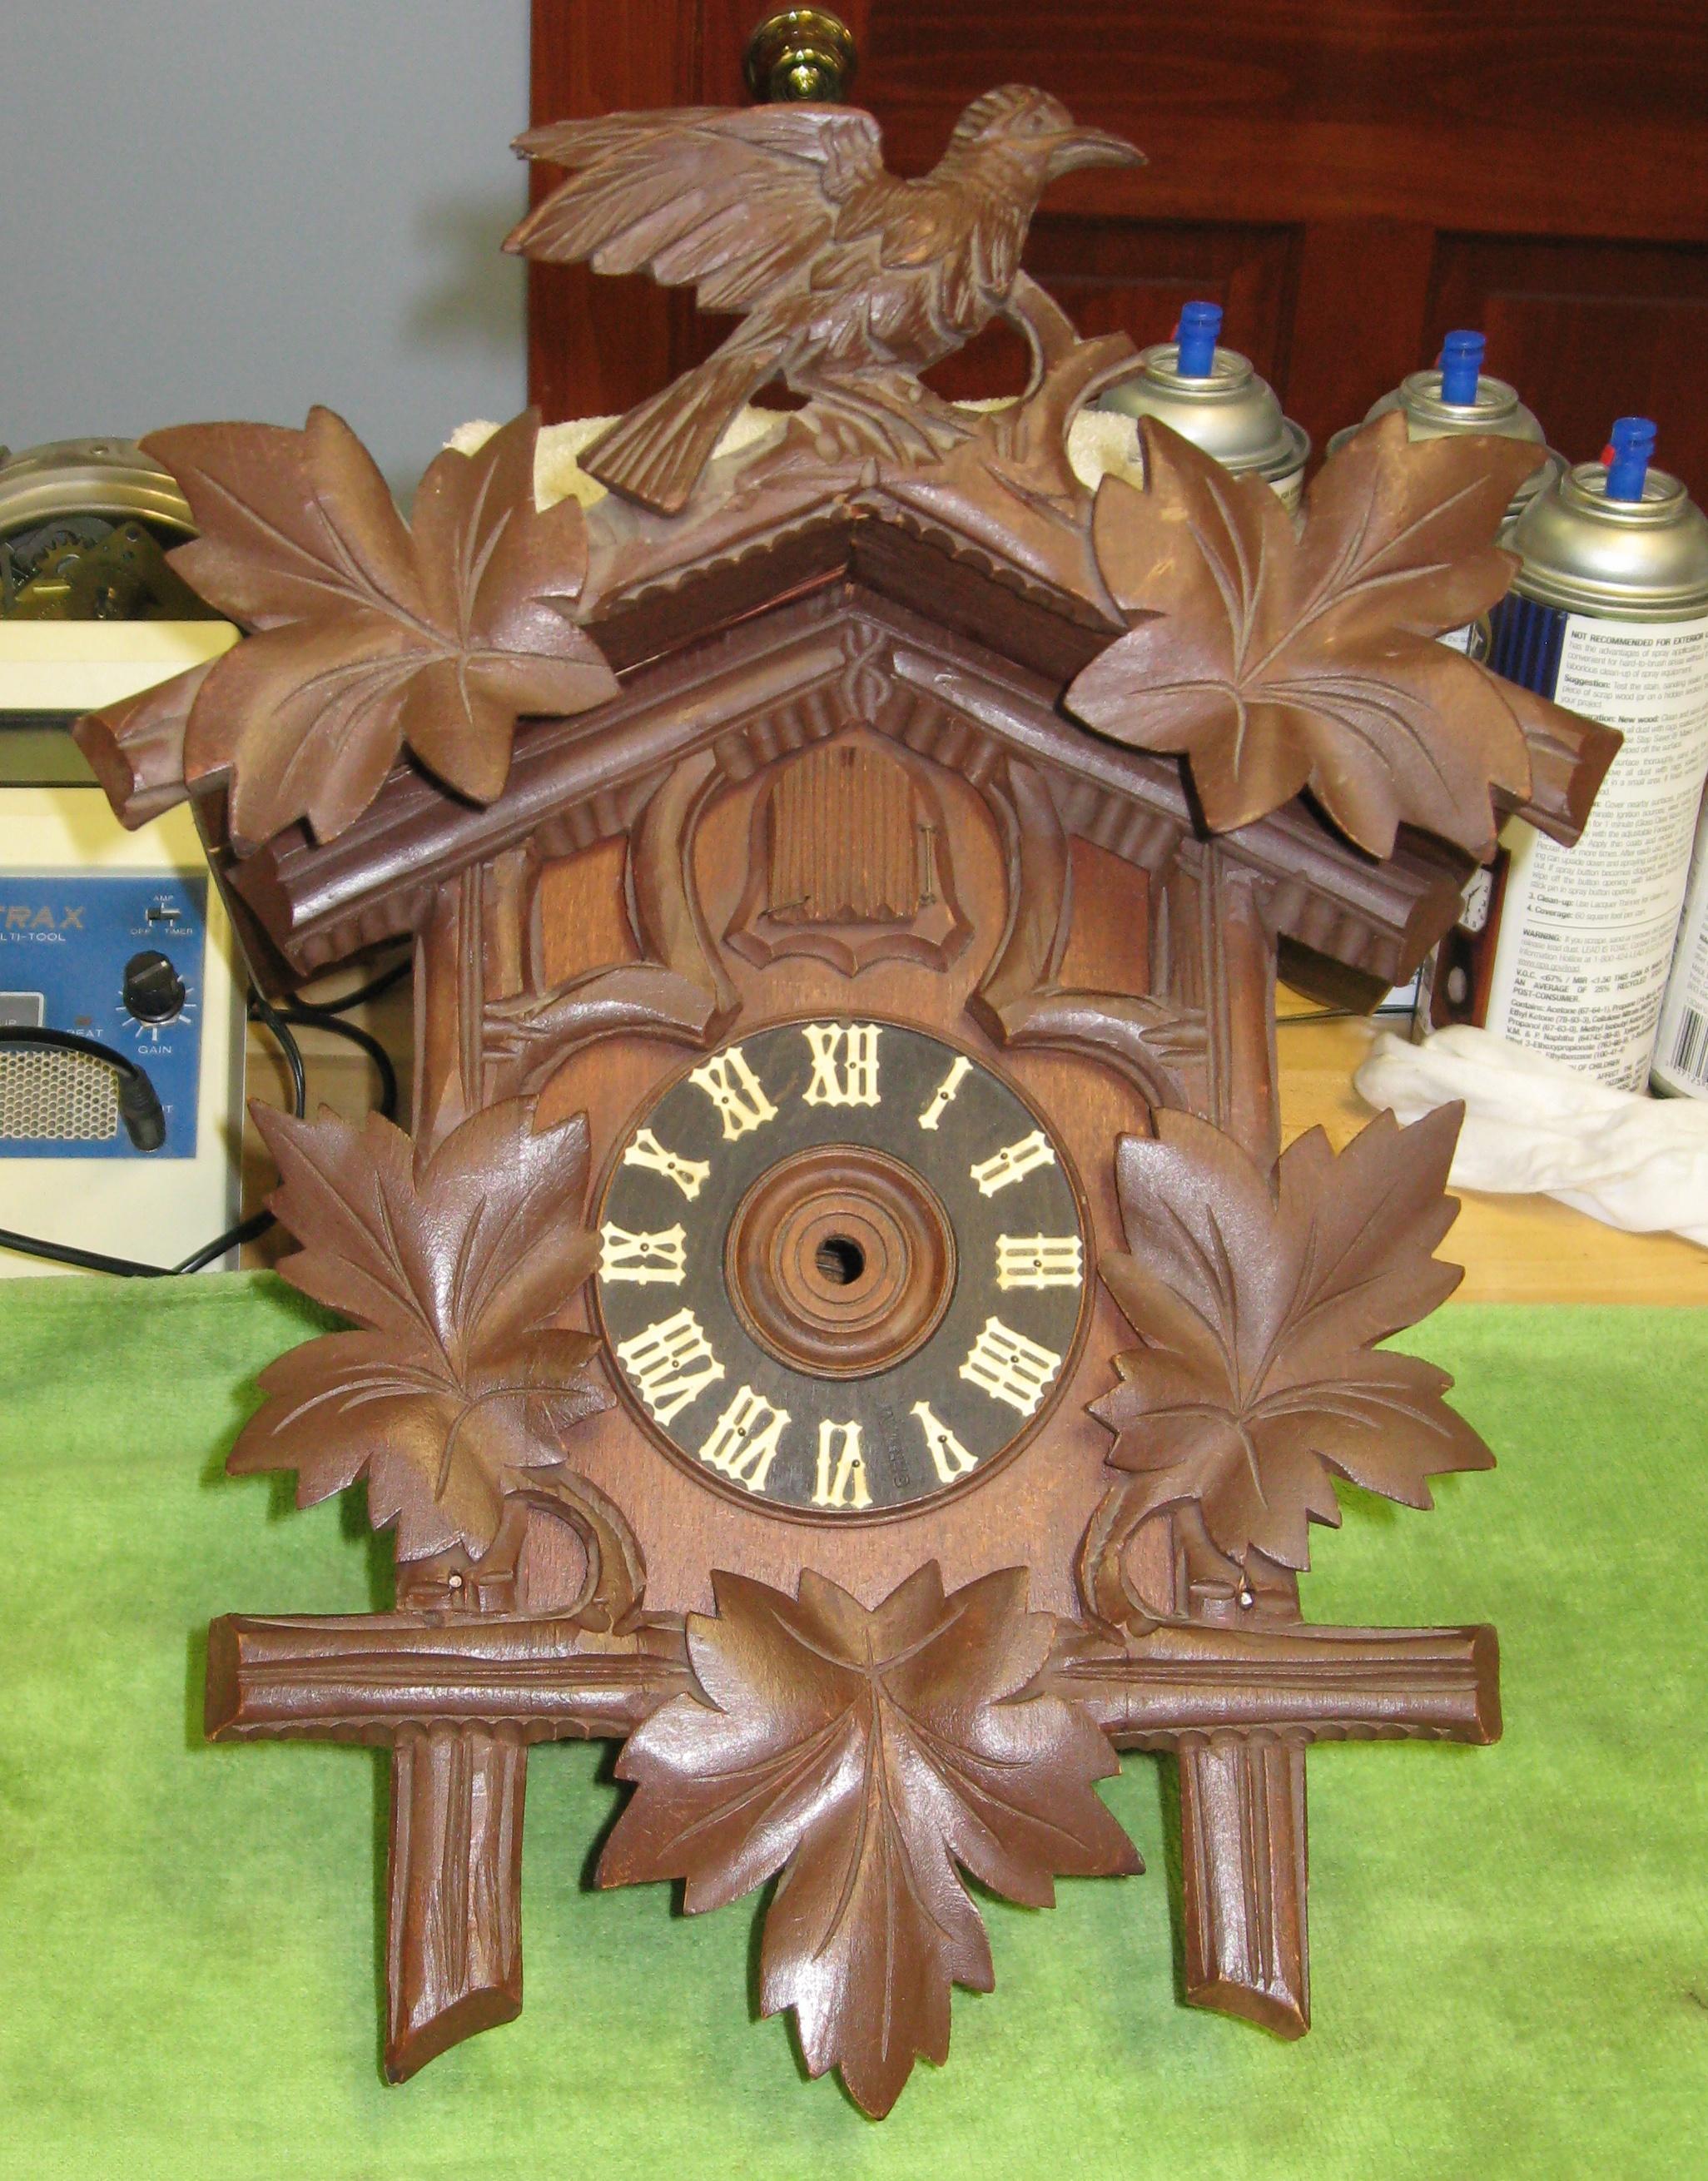 A 1950s Cuckoo Clock That Fell Off The Wall Clockinfo Com